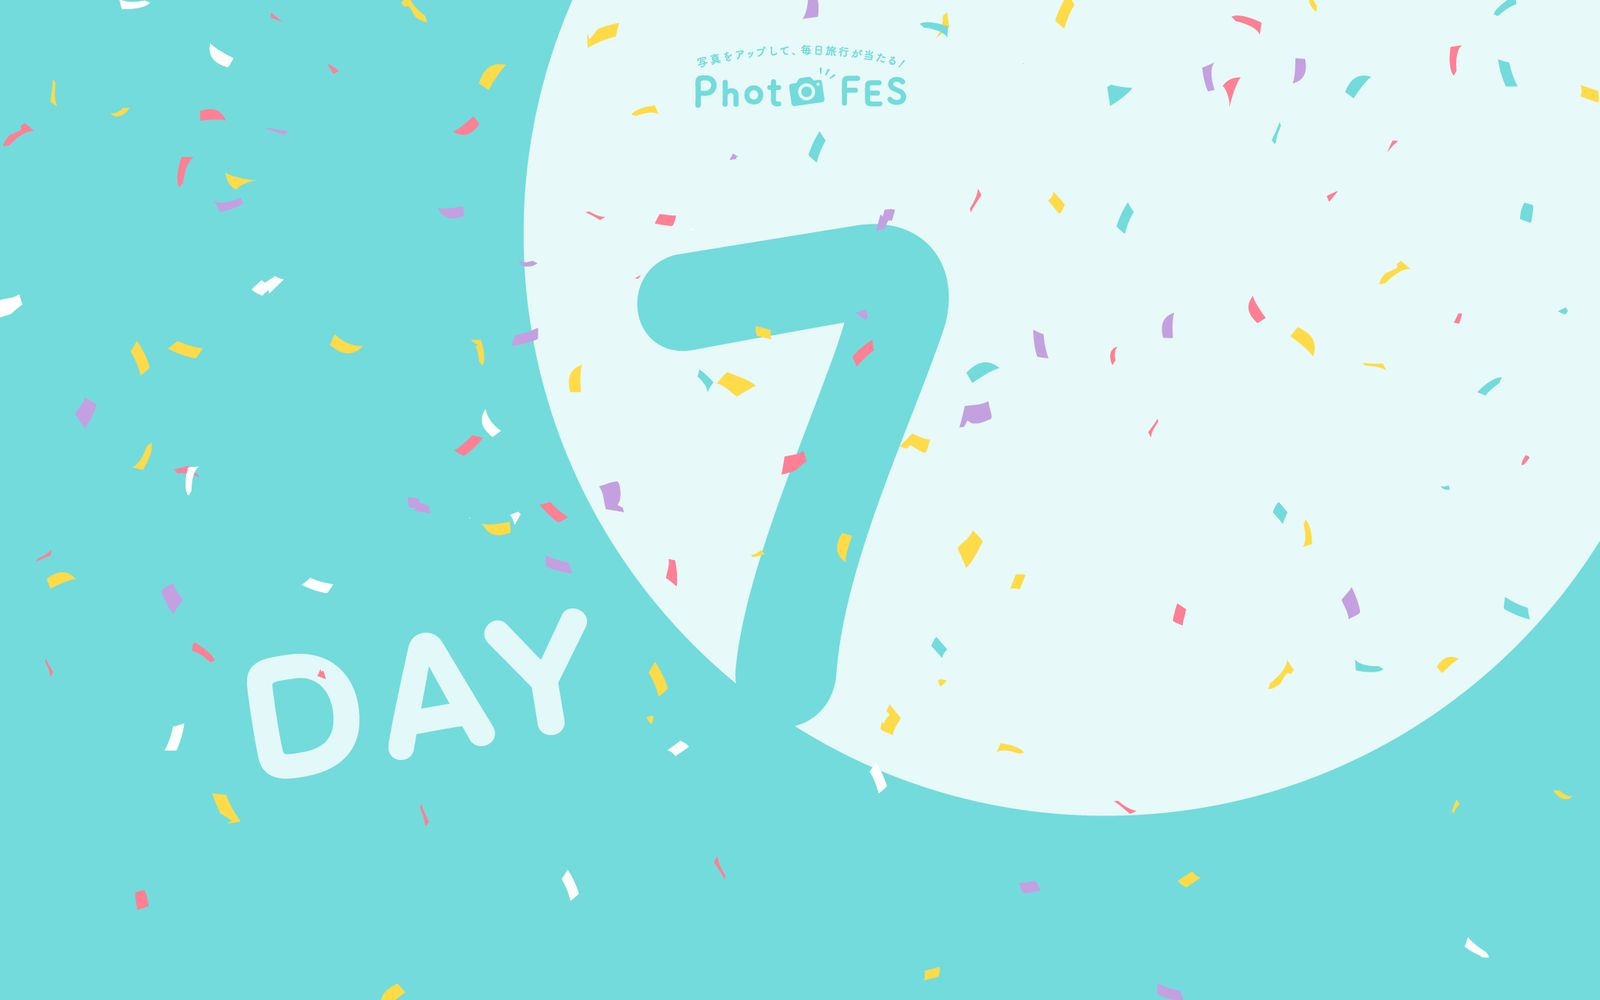 【DAY7】「Photo FES Summer シーズン2」8月23日投稿分であたる賞品&受賞者発表